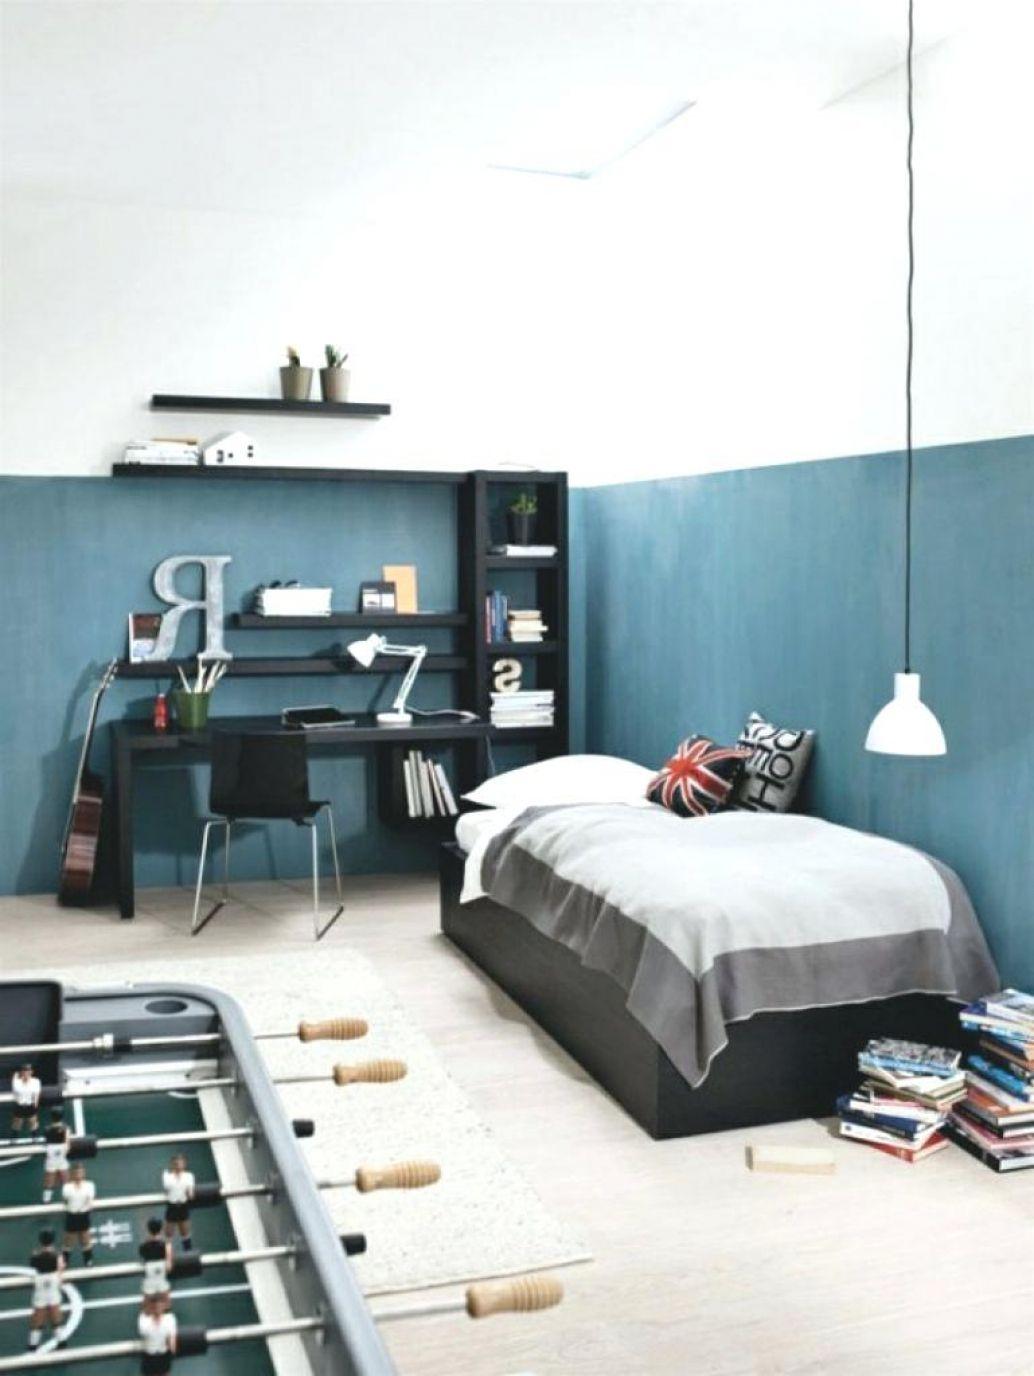 Full Size of Ikea Jugendzimmer Bildergebnis Fr Jungen Jungenzimmer Küche Kosten Betten Bei Modulküche Miniküche 160x200 Bett Sofa Mit Schlaffunktion Kaufen Wohnzimmer Ikea Jugendzimmer